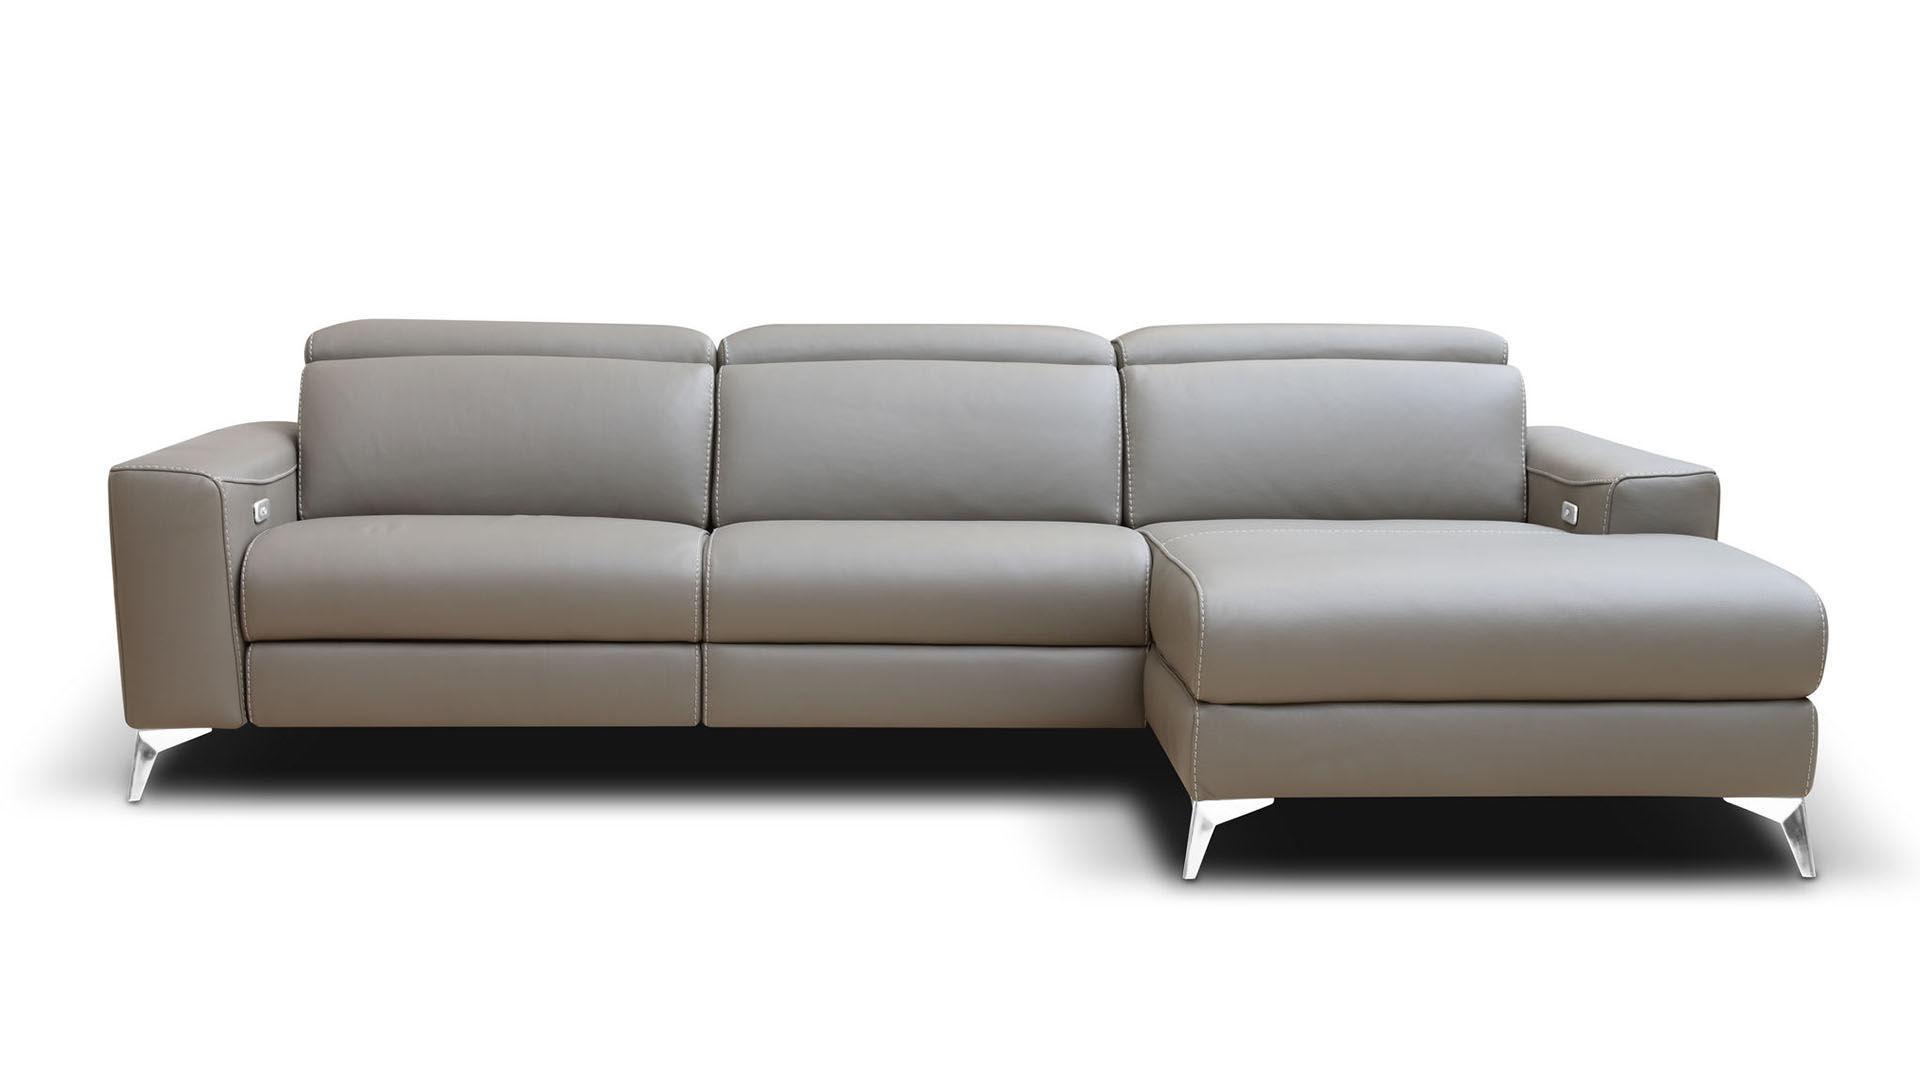 Modular Sofa Contemporary Leather Reclining Emma